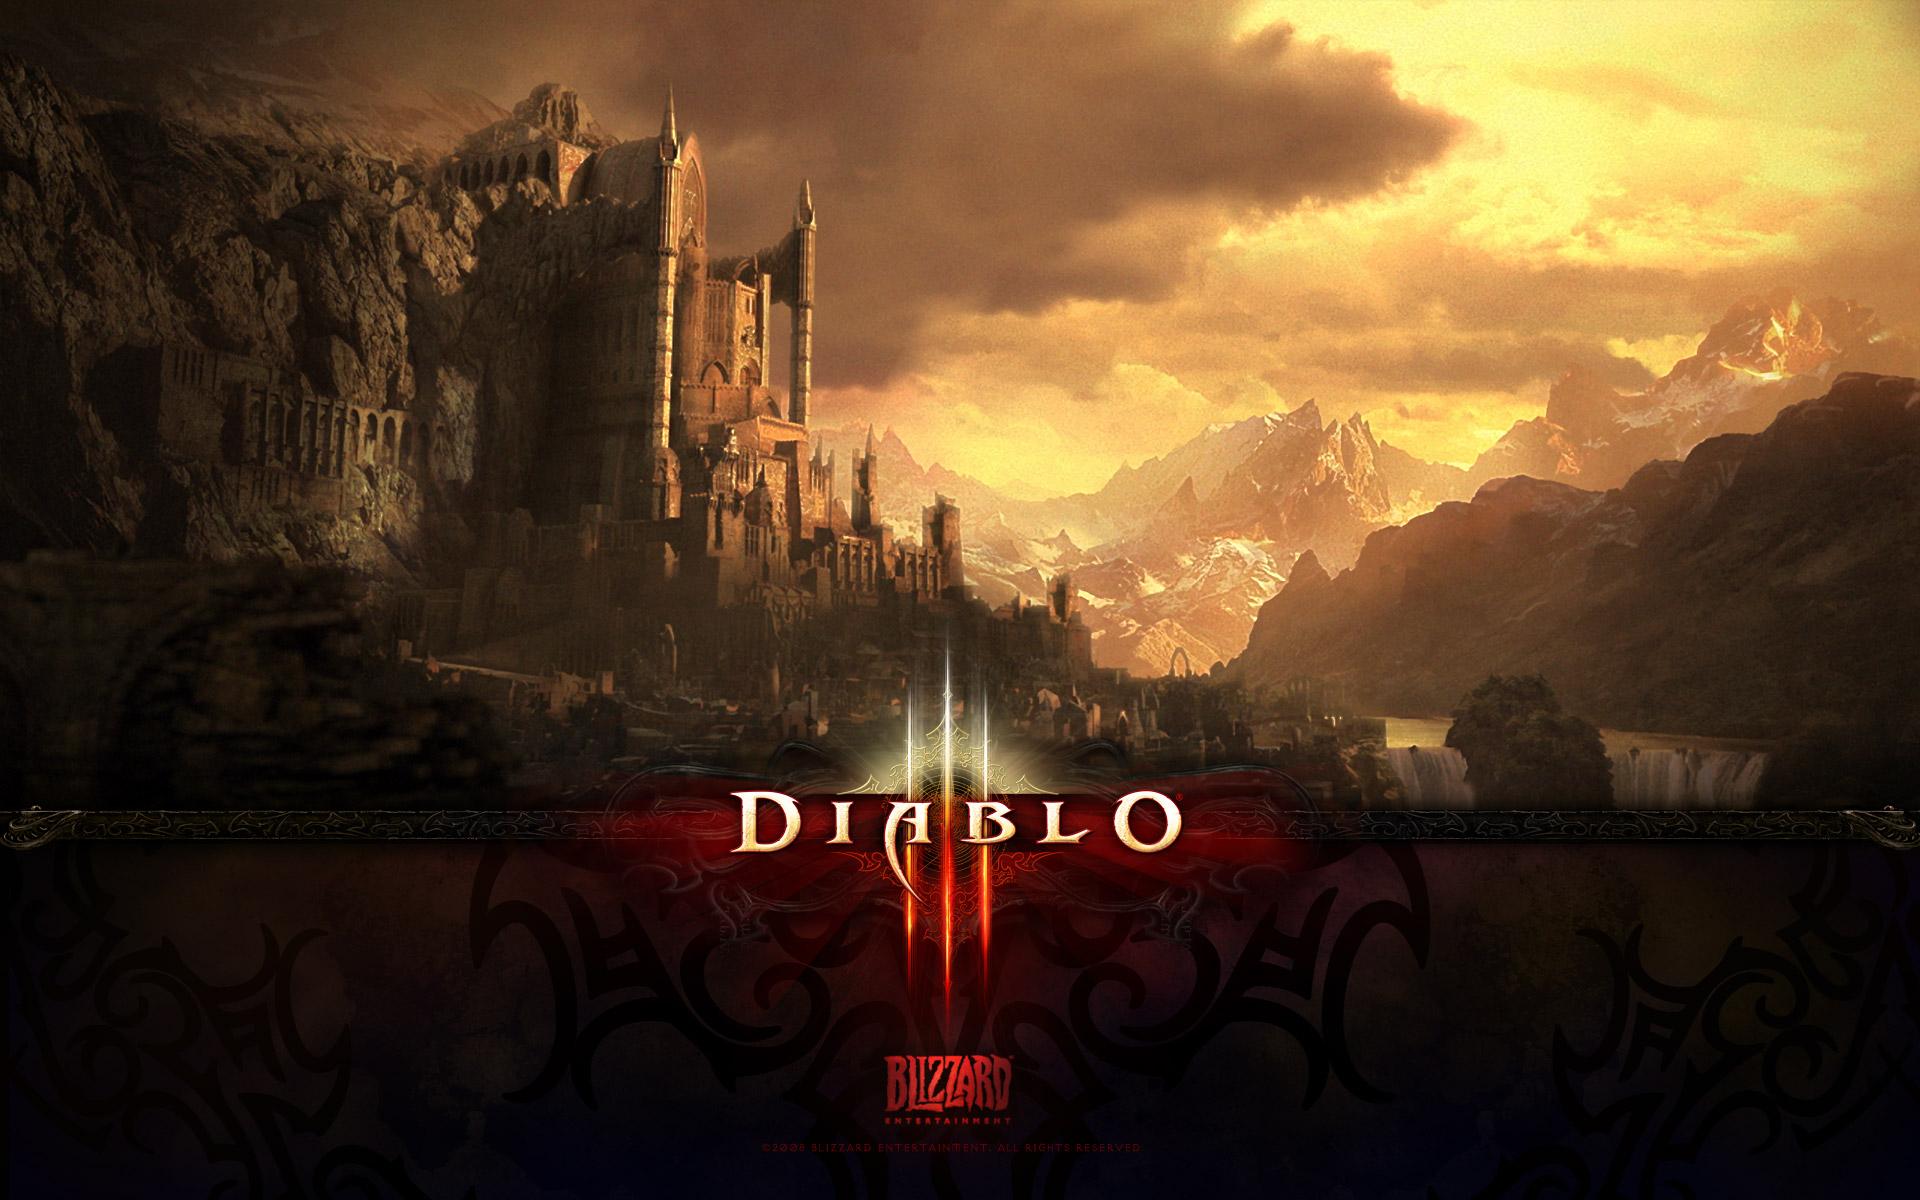 Wallpaper Diablo 3 UREH Jeux video